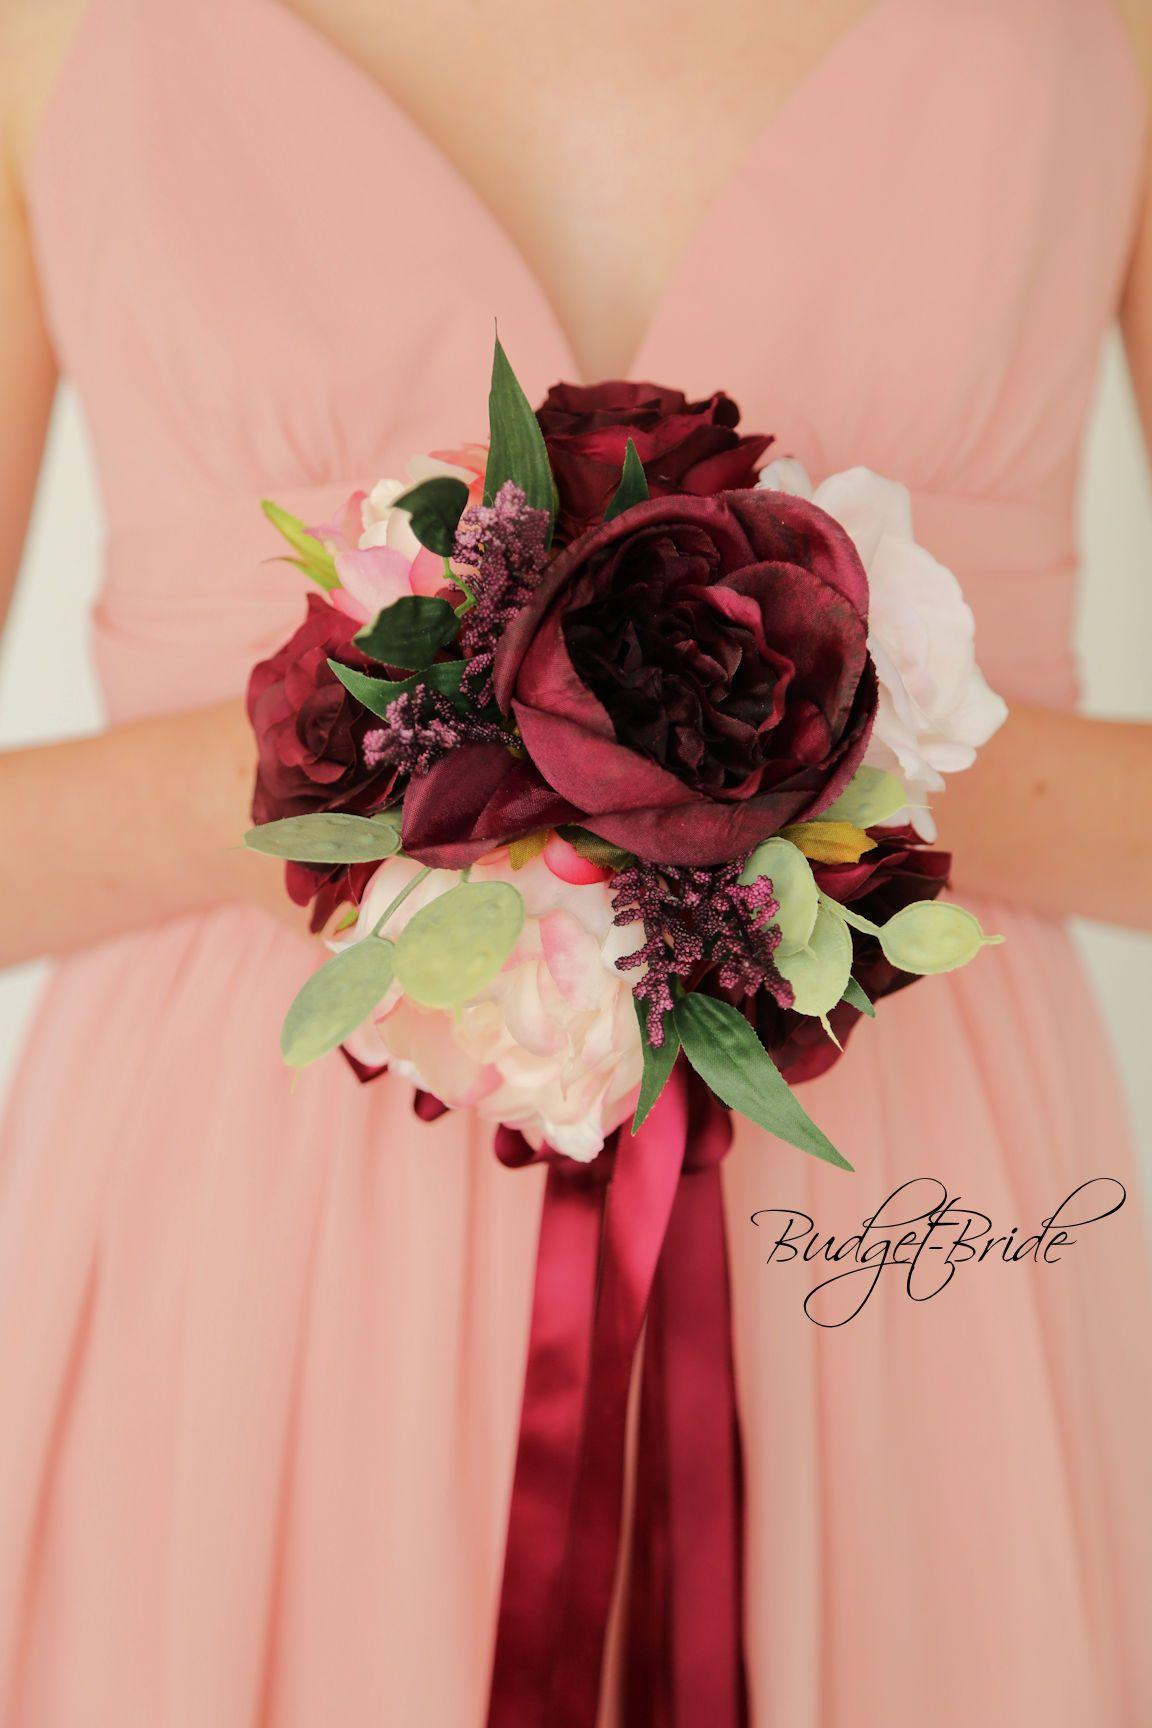 Davids Bridal Wine Wedding Flowers Bridal Wine Wine Wedding Flowers Bridal Party Flowers